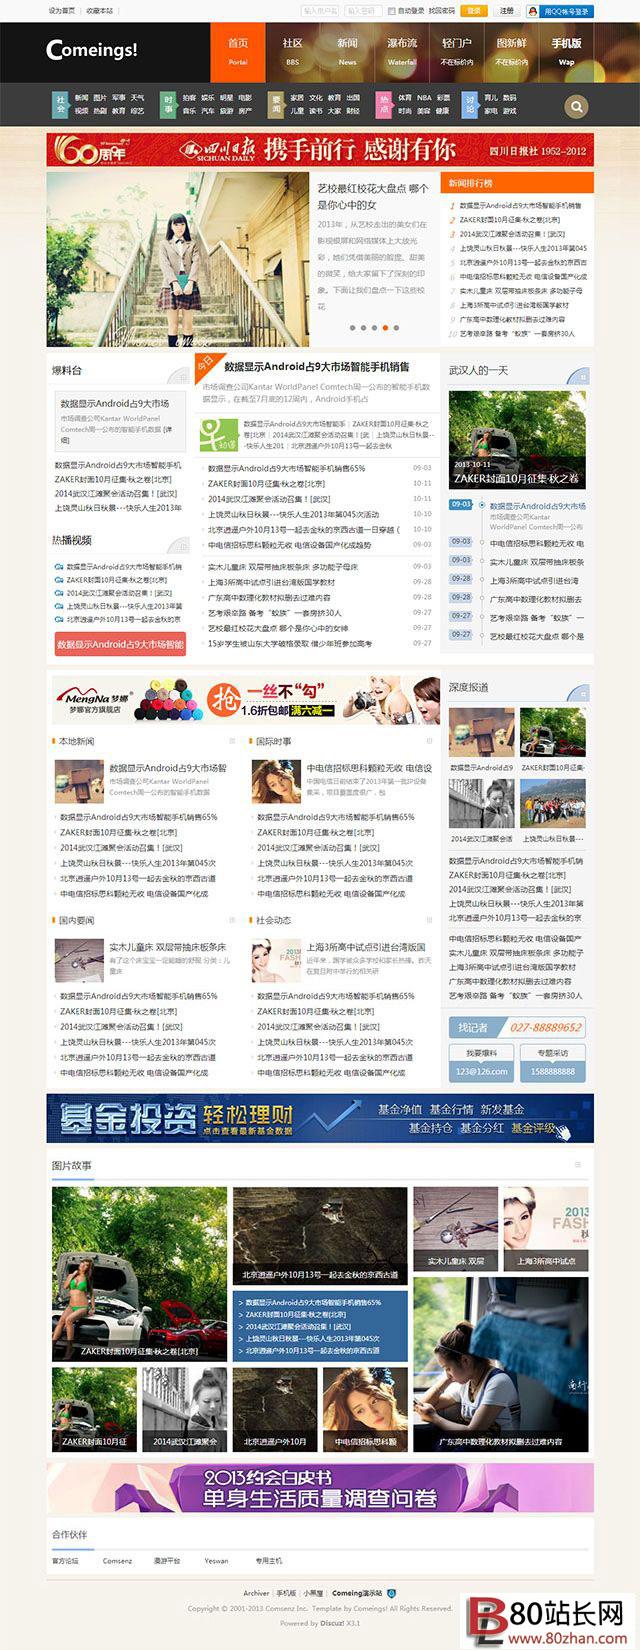 Discuz X3.4模板 Cis!_Colun_two门户论坛网站源码4套配色方案